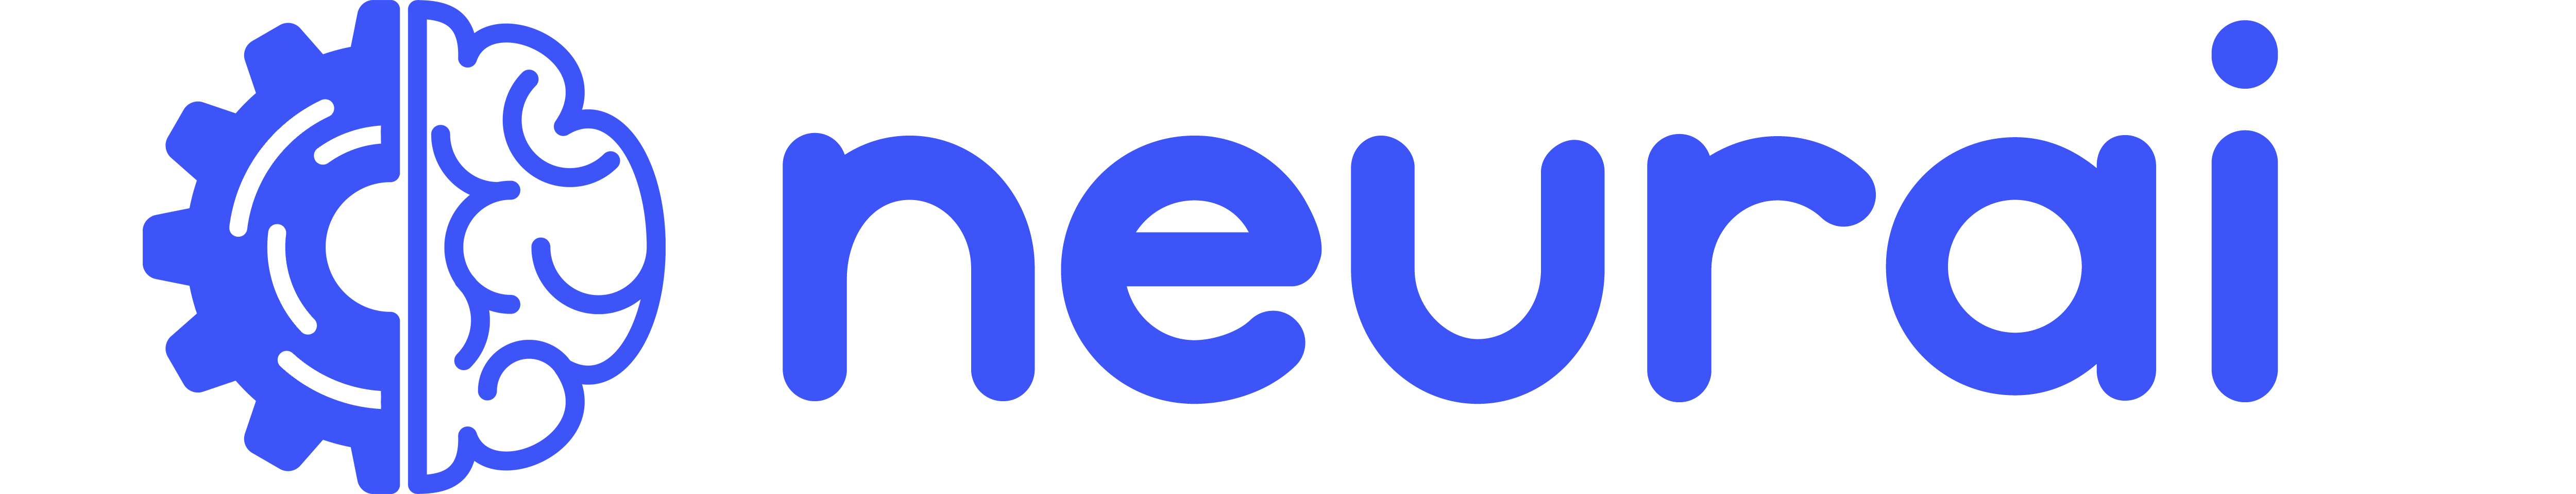 Neurai company logo